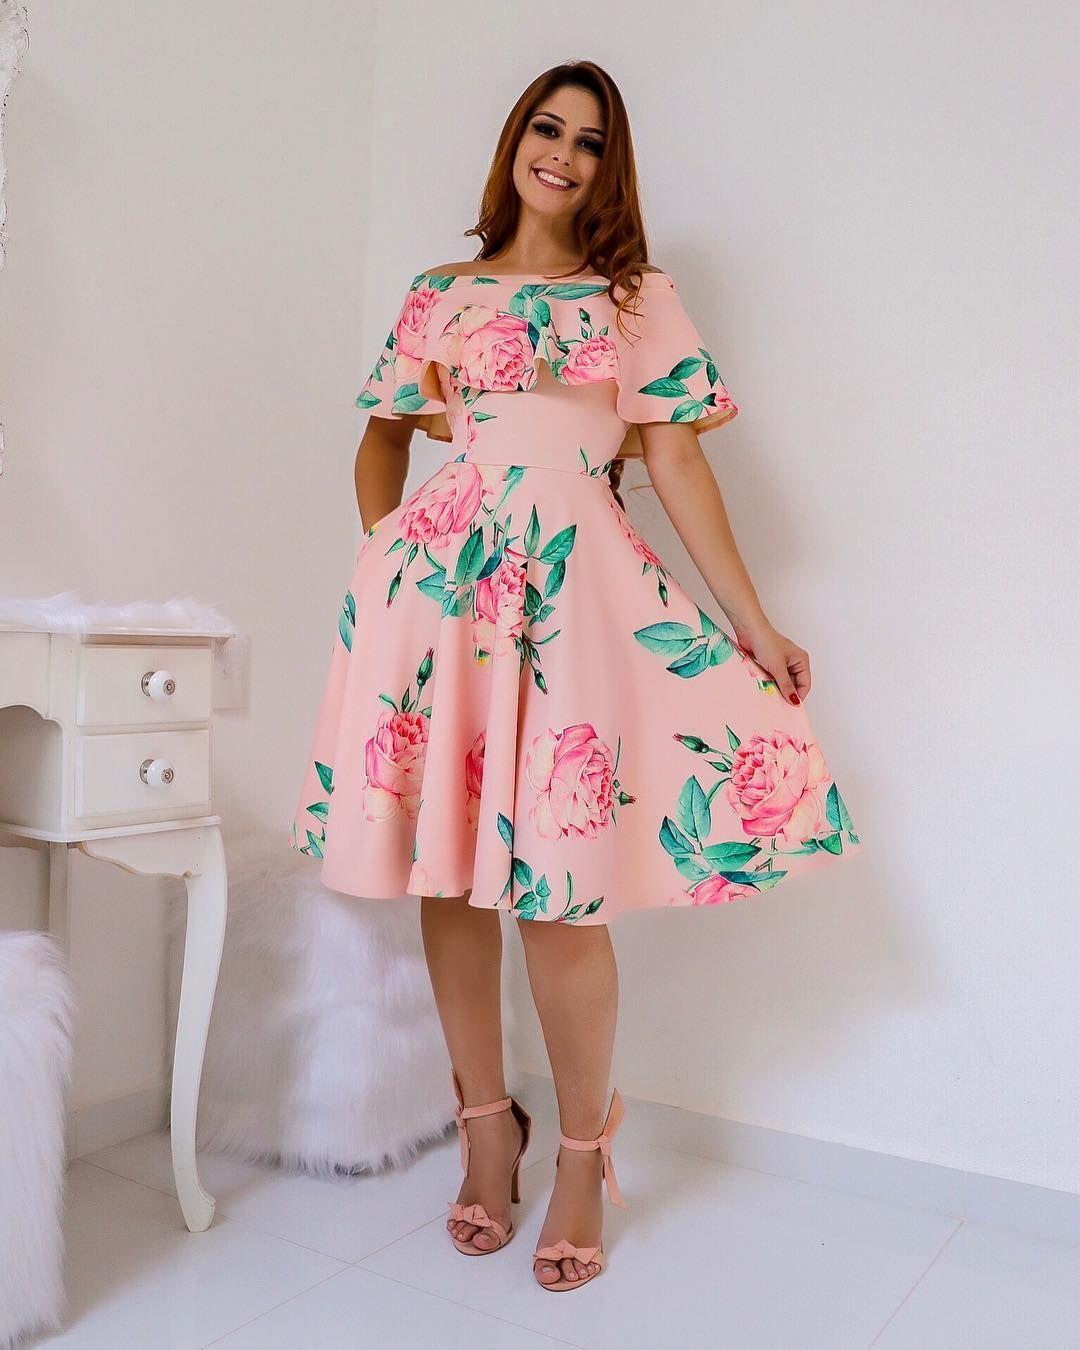 a30603cb4 Mustache Store 👗 | Vestidos/Ropa em 2019 | Fashion, Dresses e Cute ...